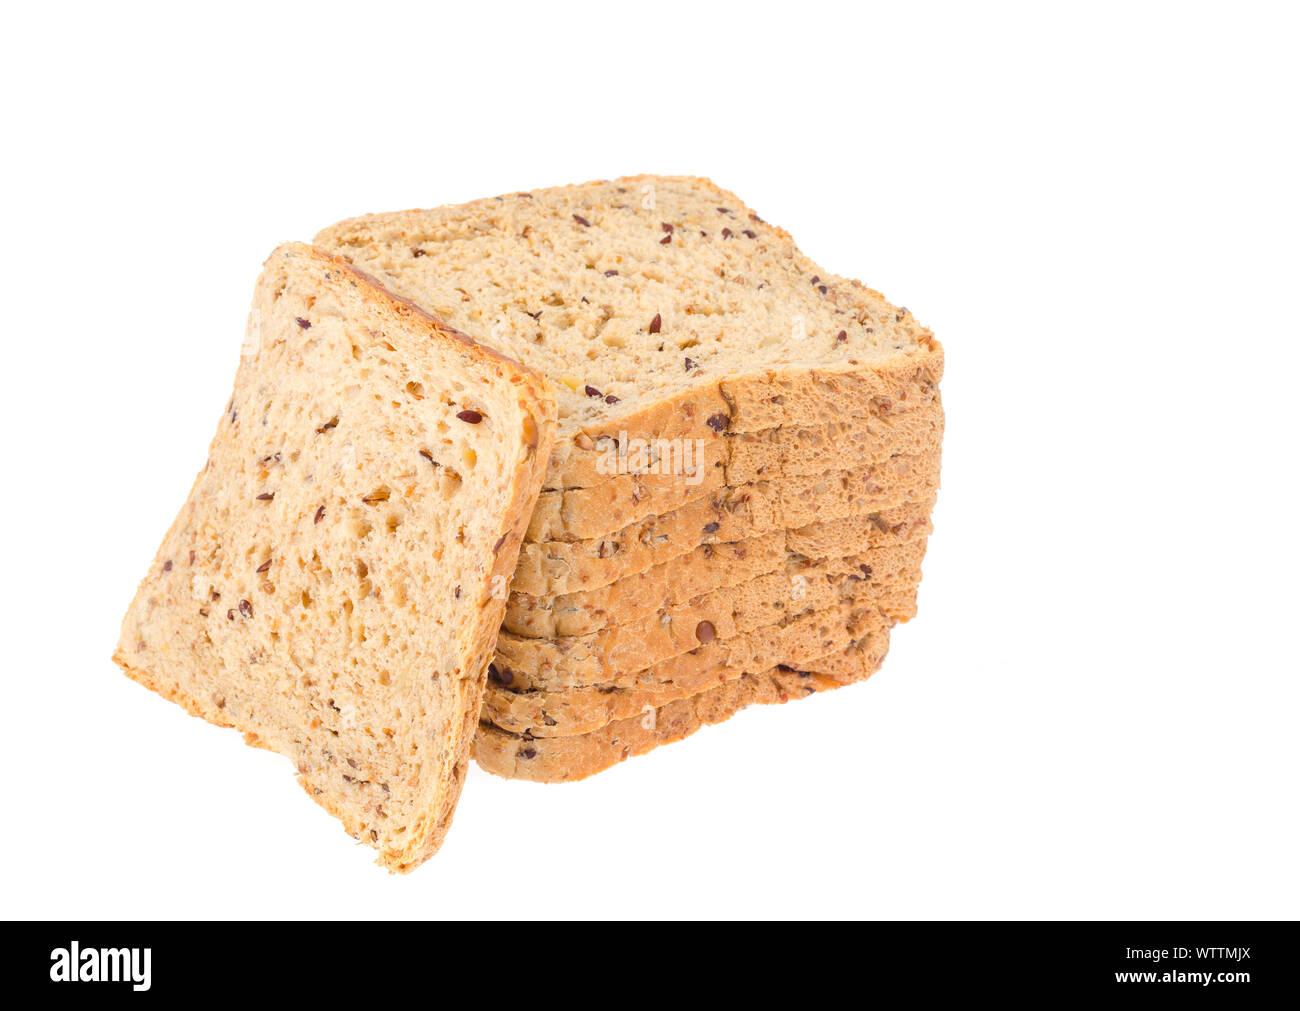 Stack of sliced chopped whole grain bread. Studio Photo Stock Photo